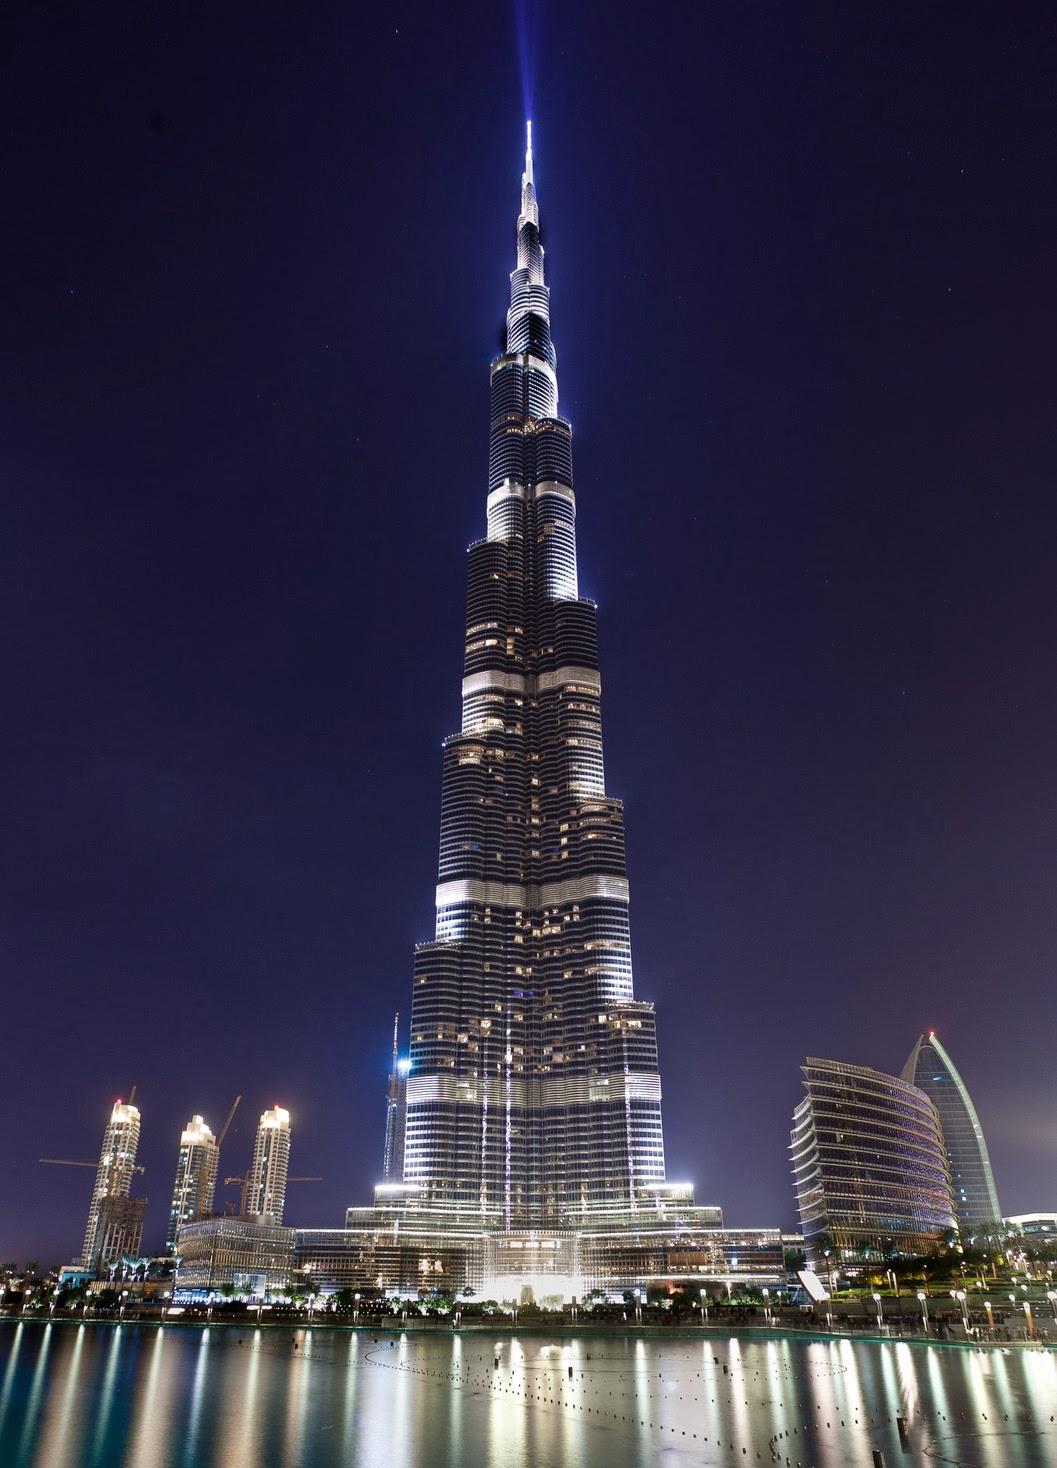 Free download Burj Khalifa New Wallpapers Islamic Blog